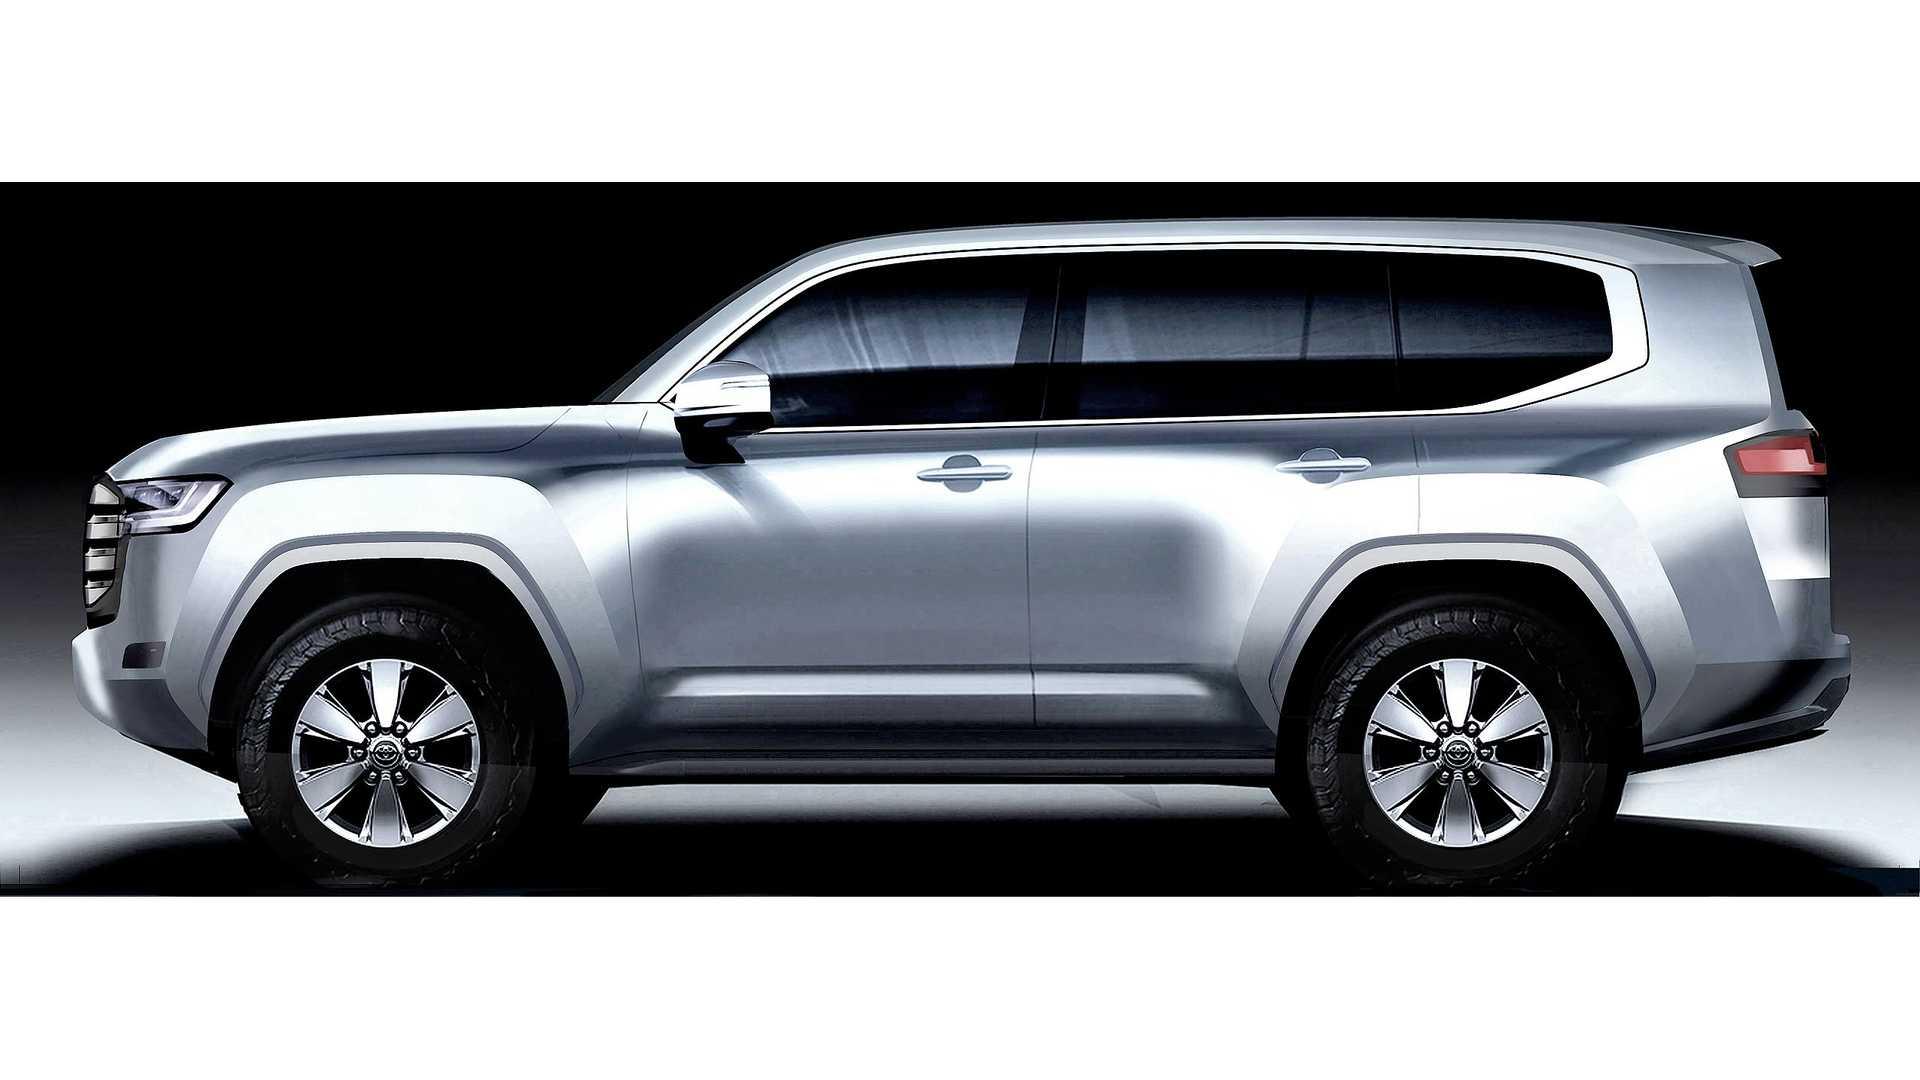 Toyota-Land-Cruiser-design-sketches-13